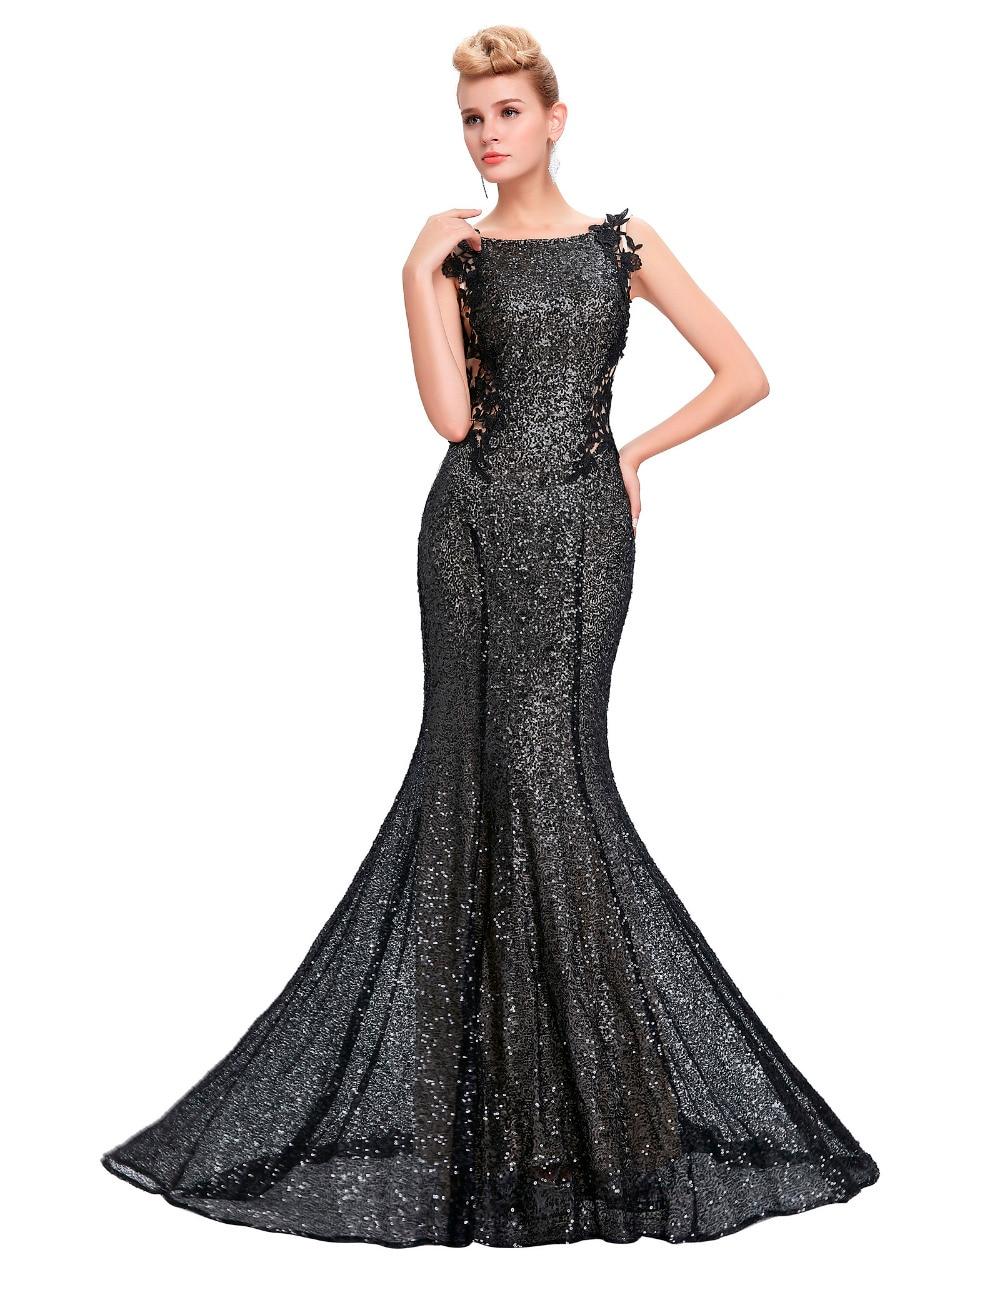 Black with grey bridesmaid dresses dress images for Dark grey wedding dresses